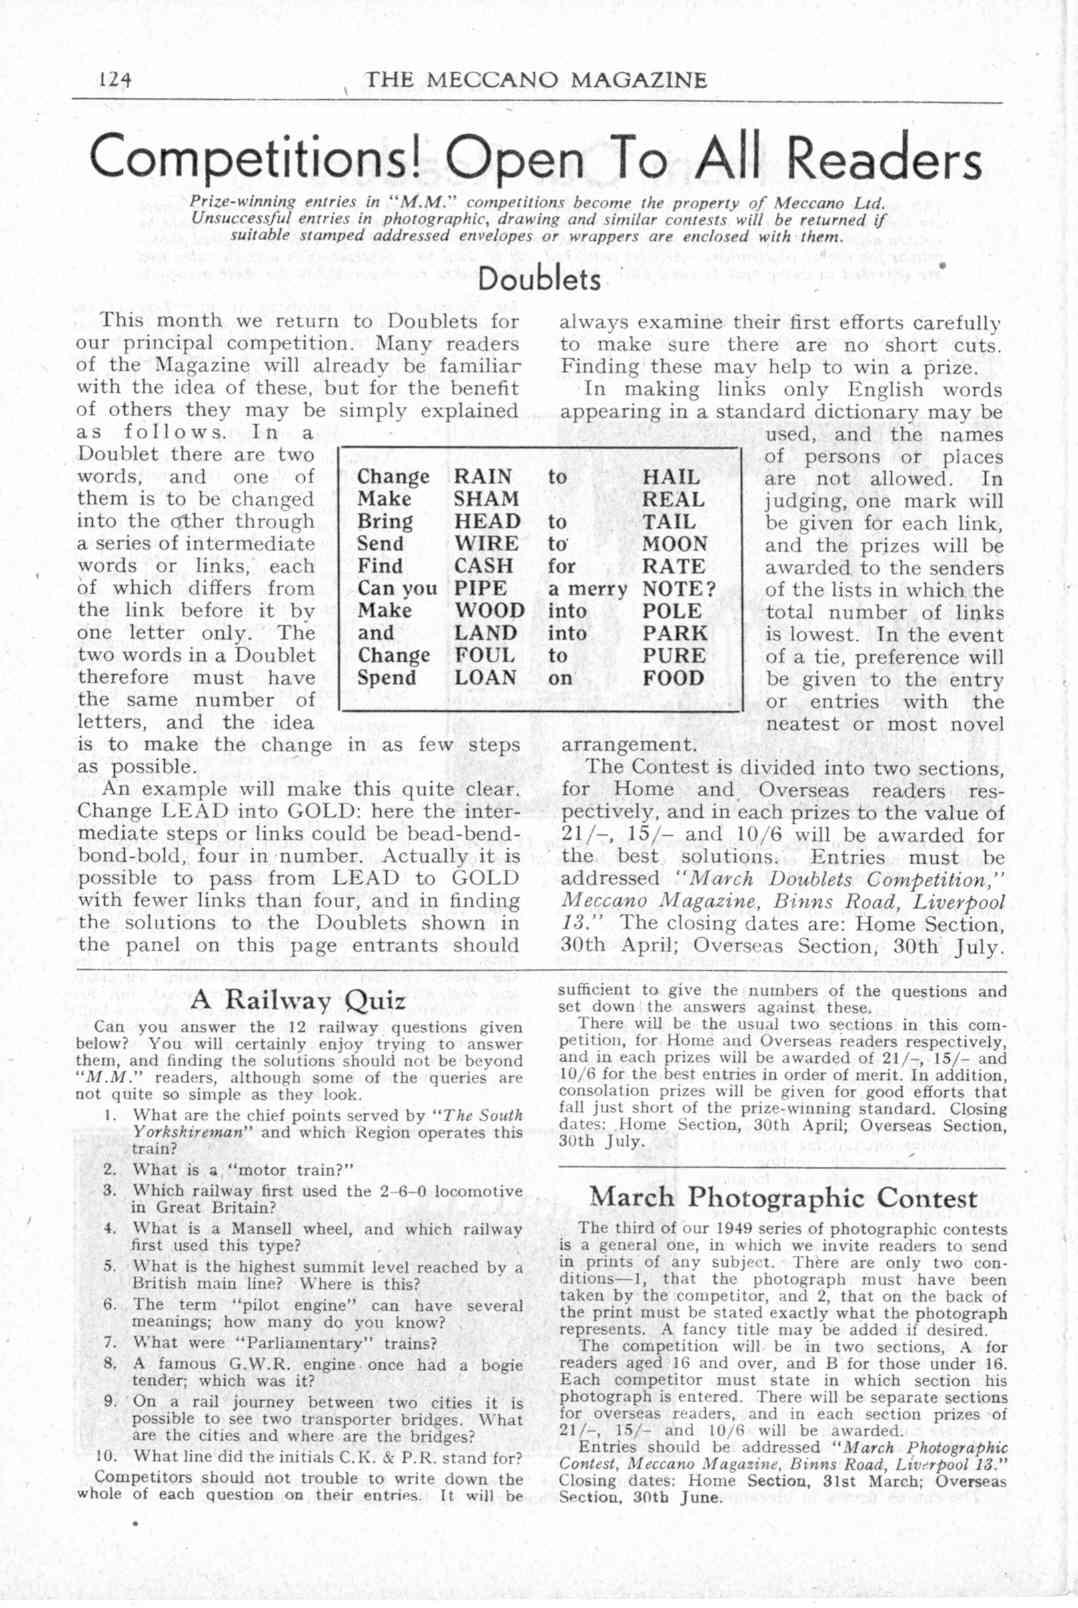 UK Meccano Magazine March 1949 Page 124